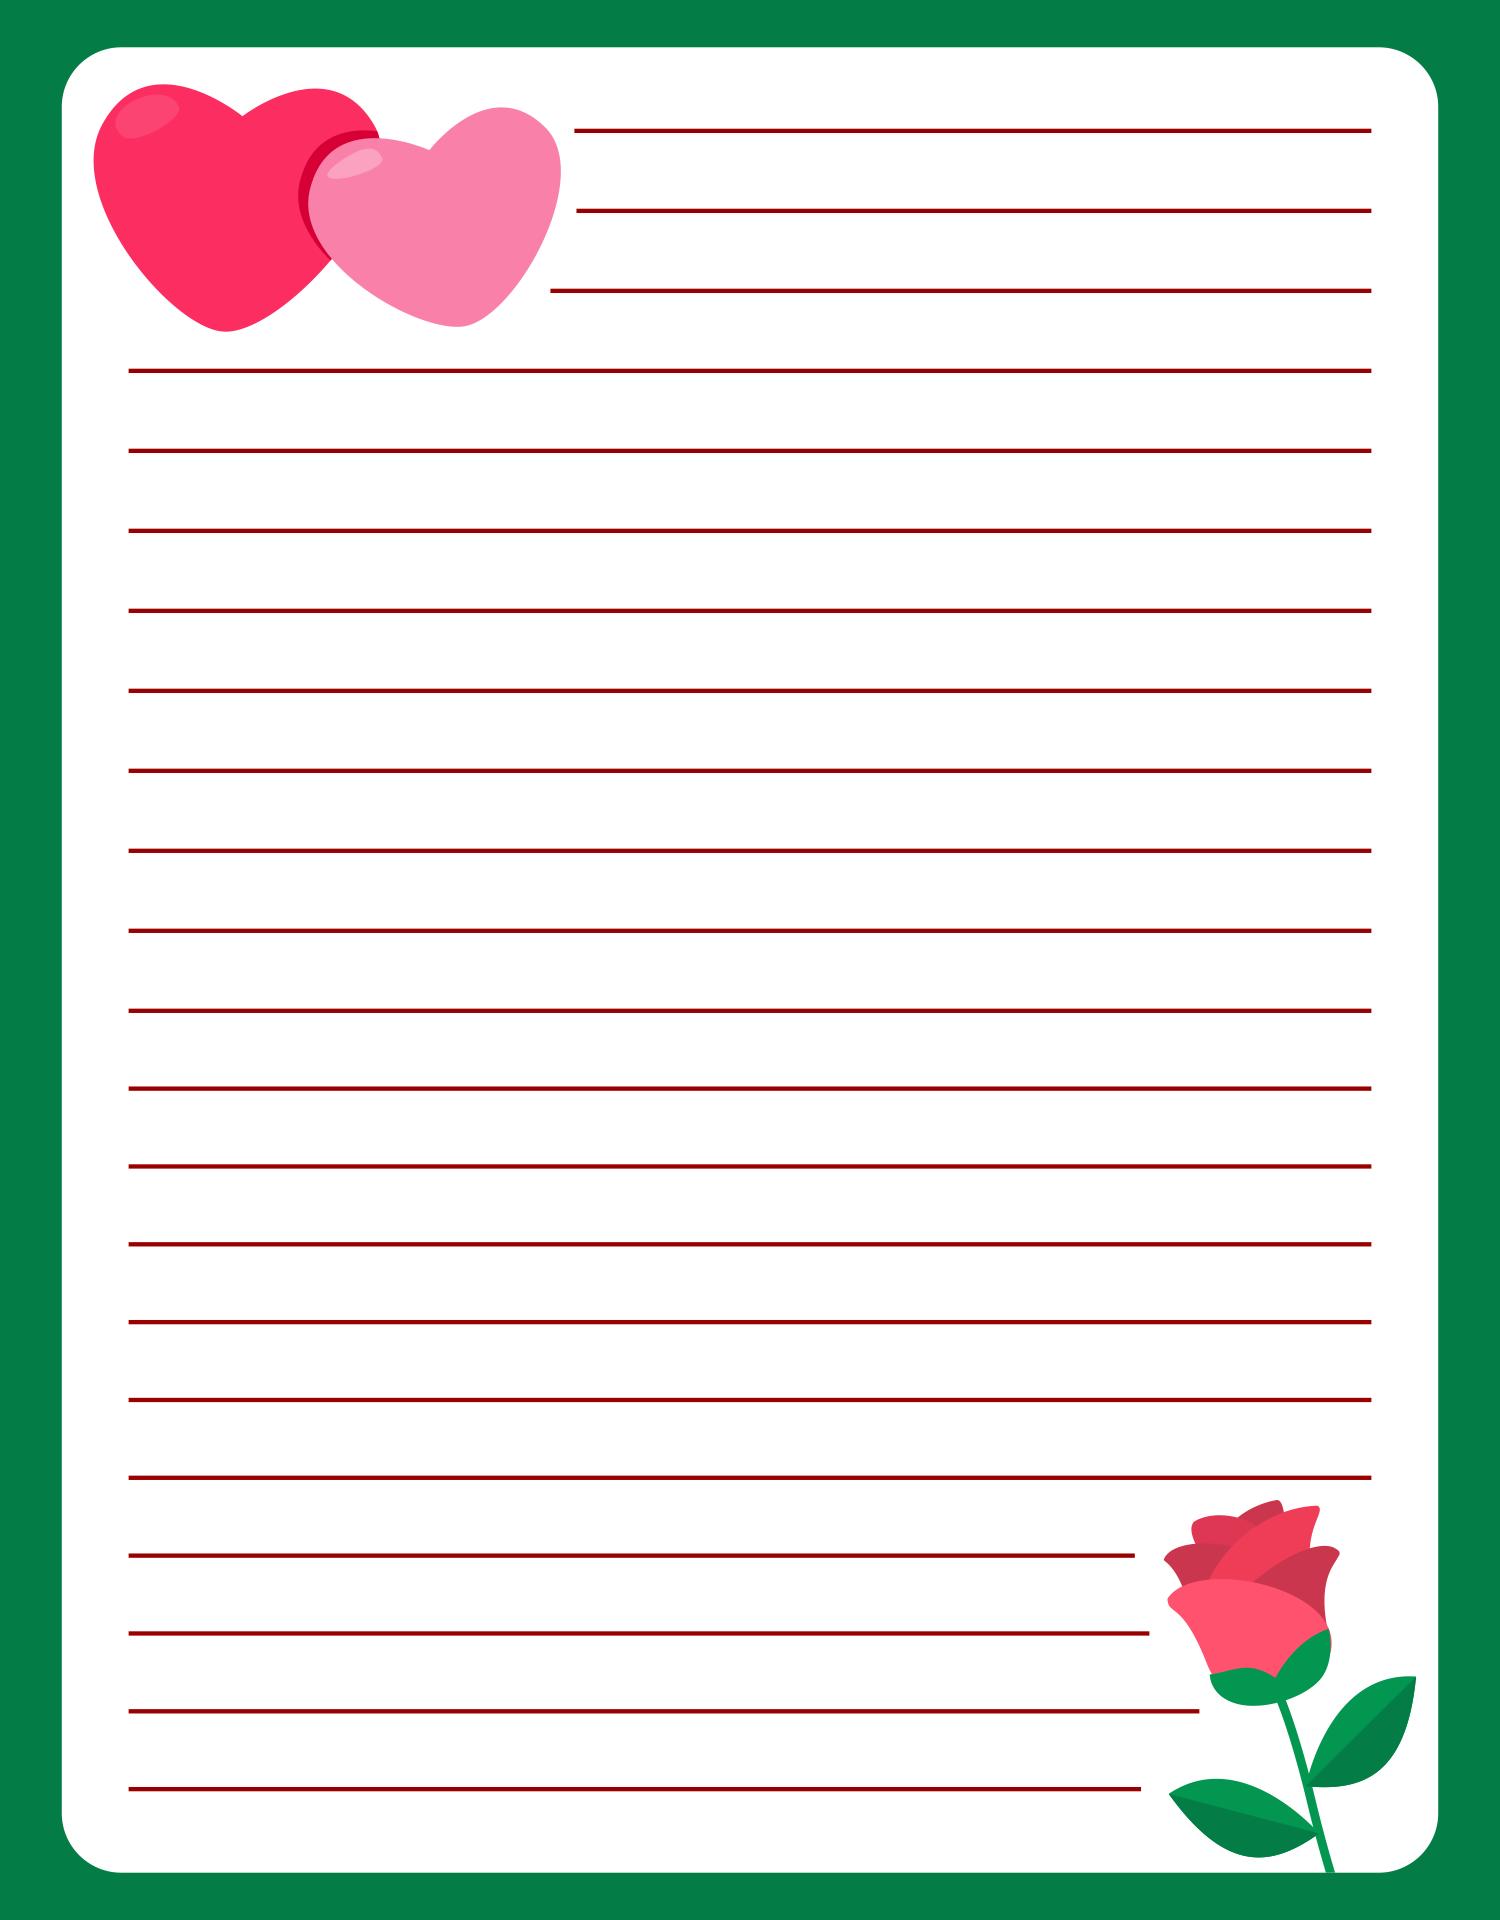 Heart Love Valentine Letter Template